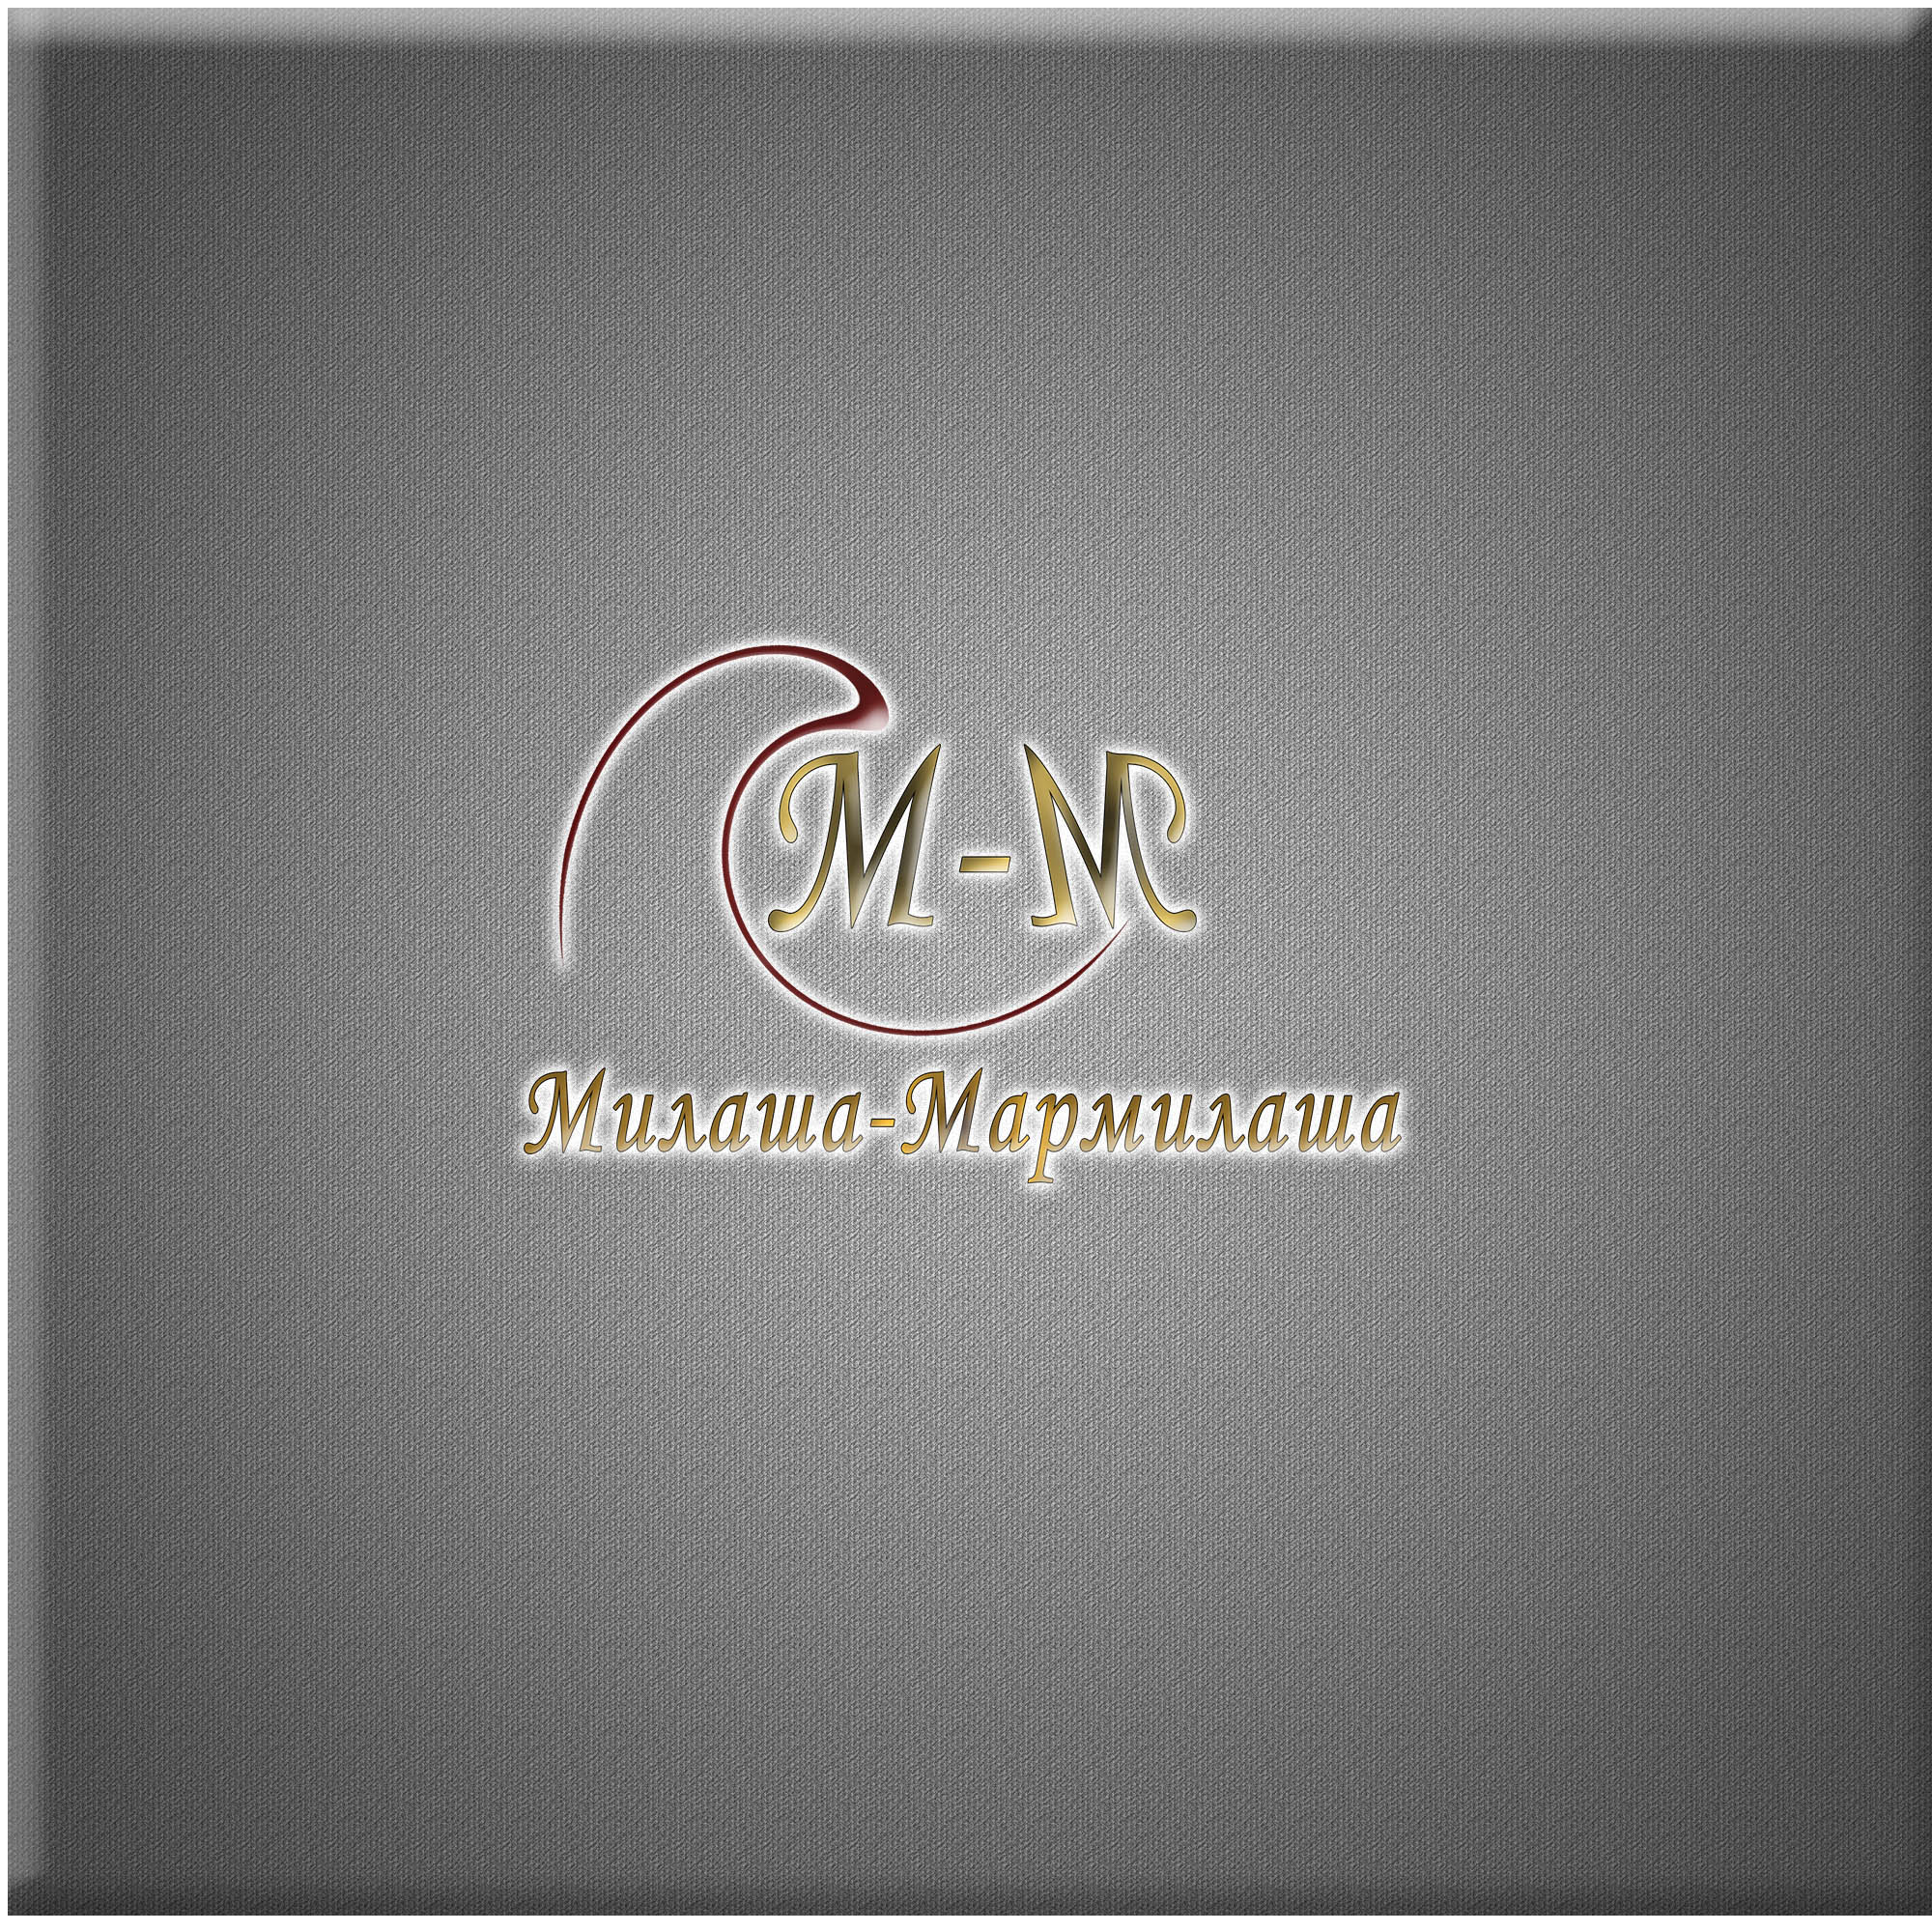 "Логотип для товарного знака ""Милаша-Мармилаша"" фото f_6465874b1a6ea749.jpg"